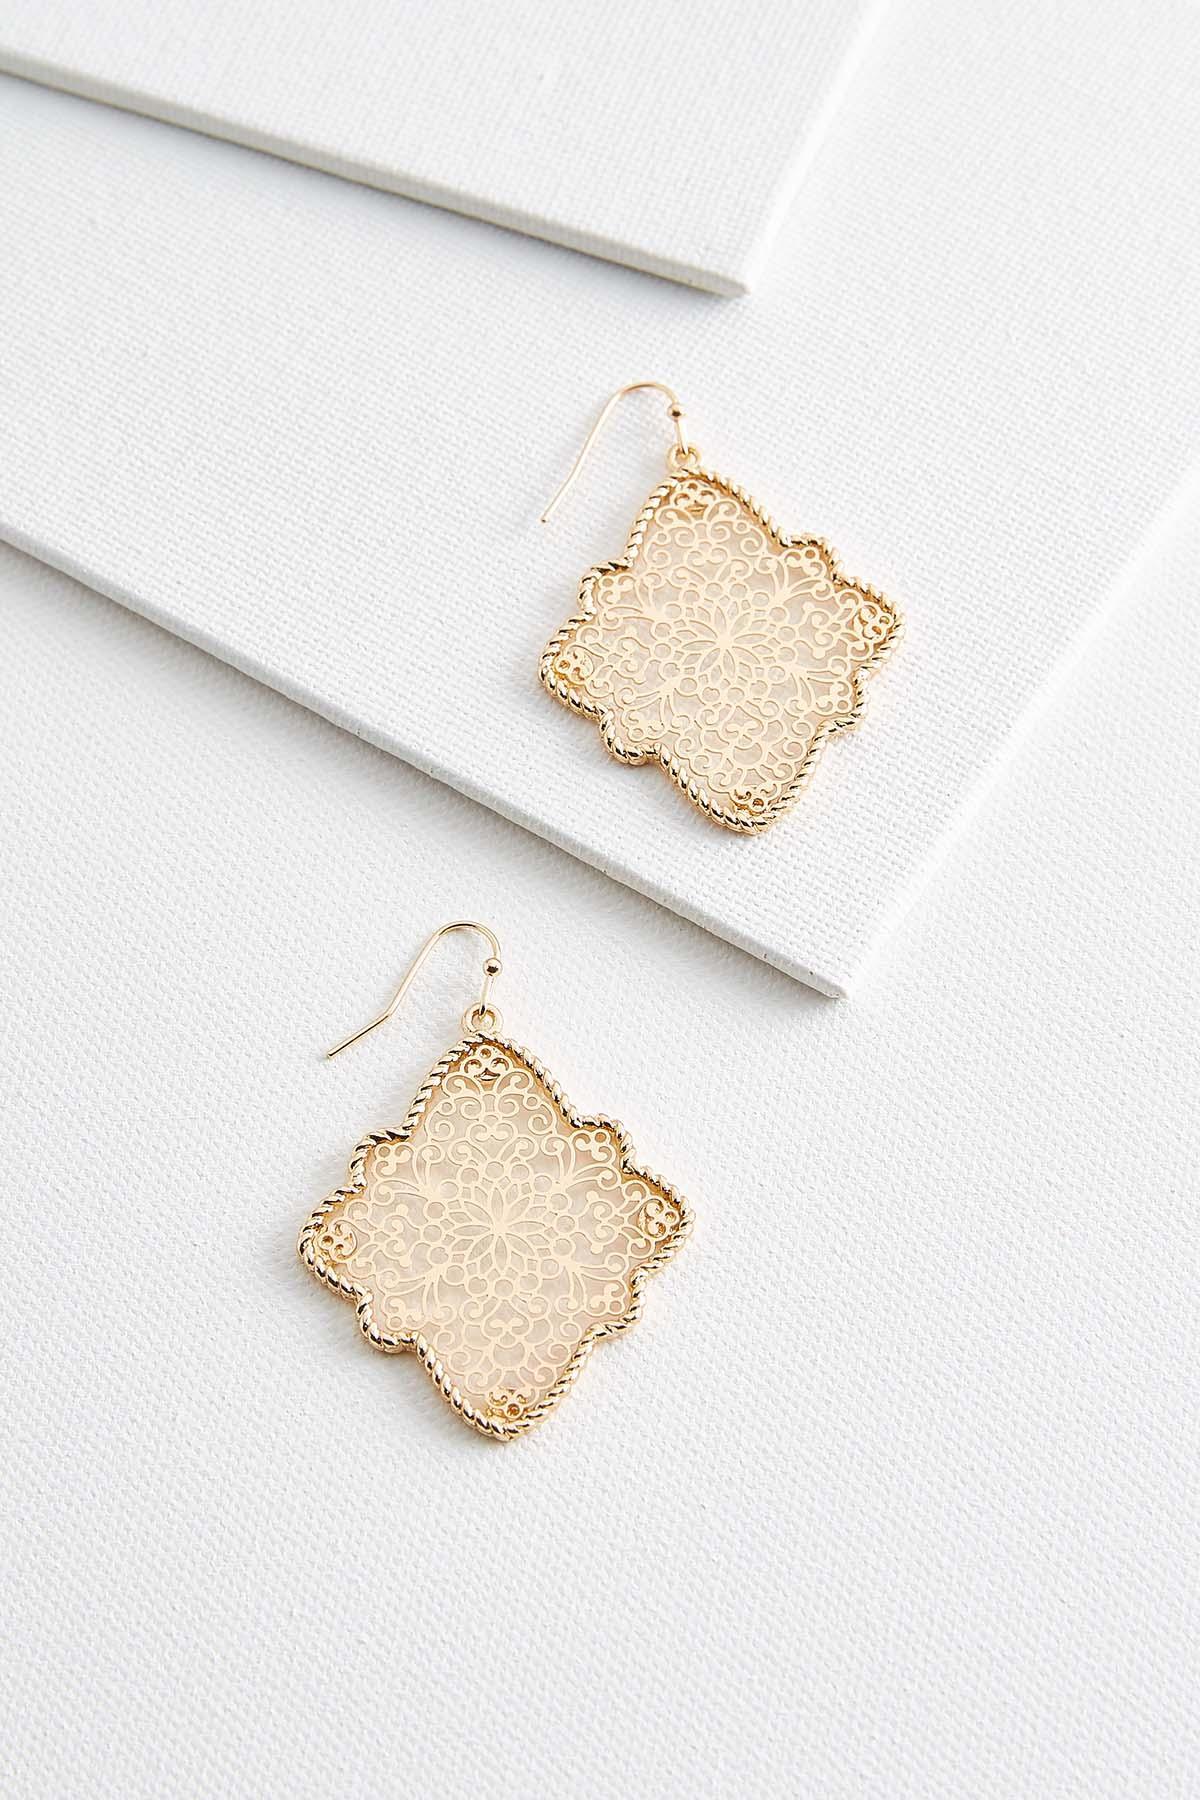 Filigree Diamond Shaped Earrings